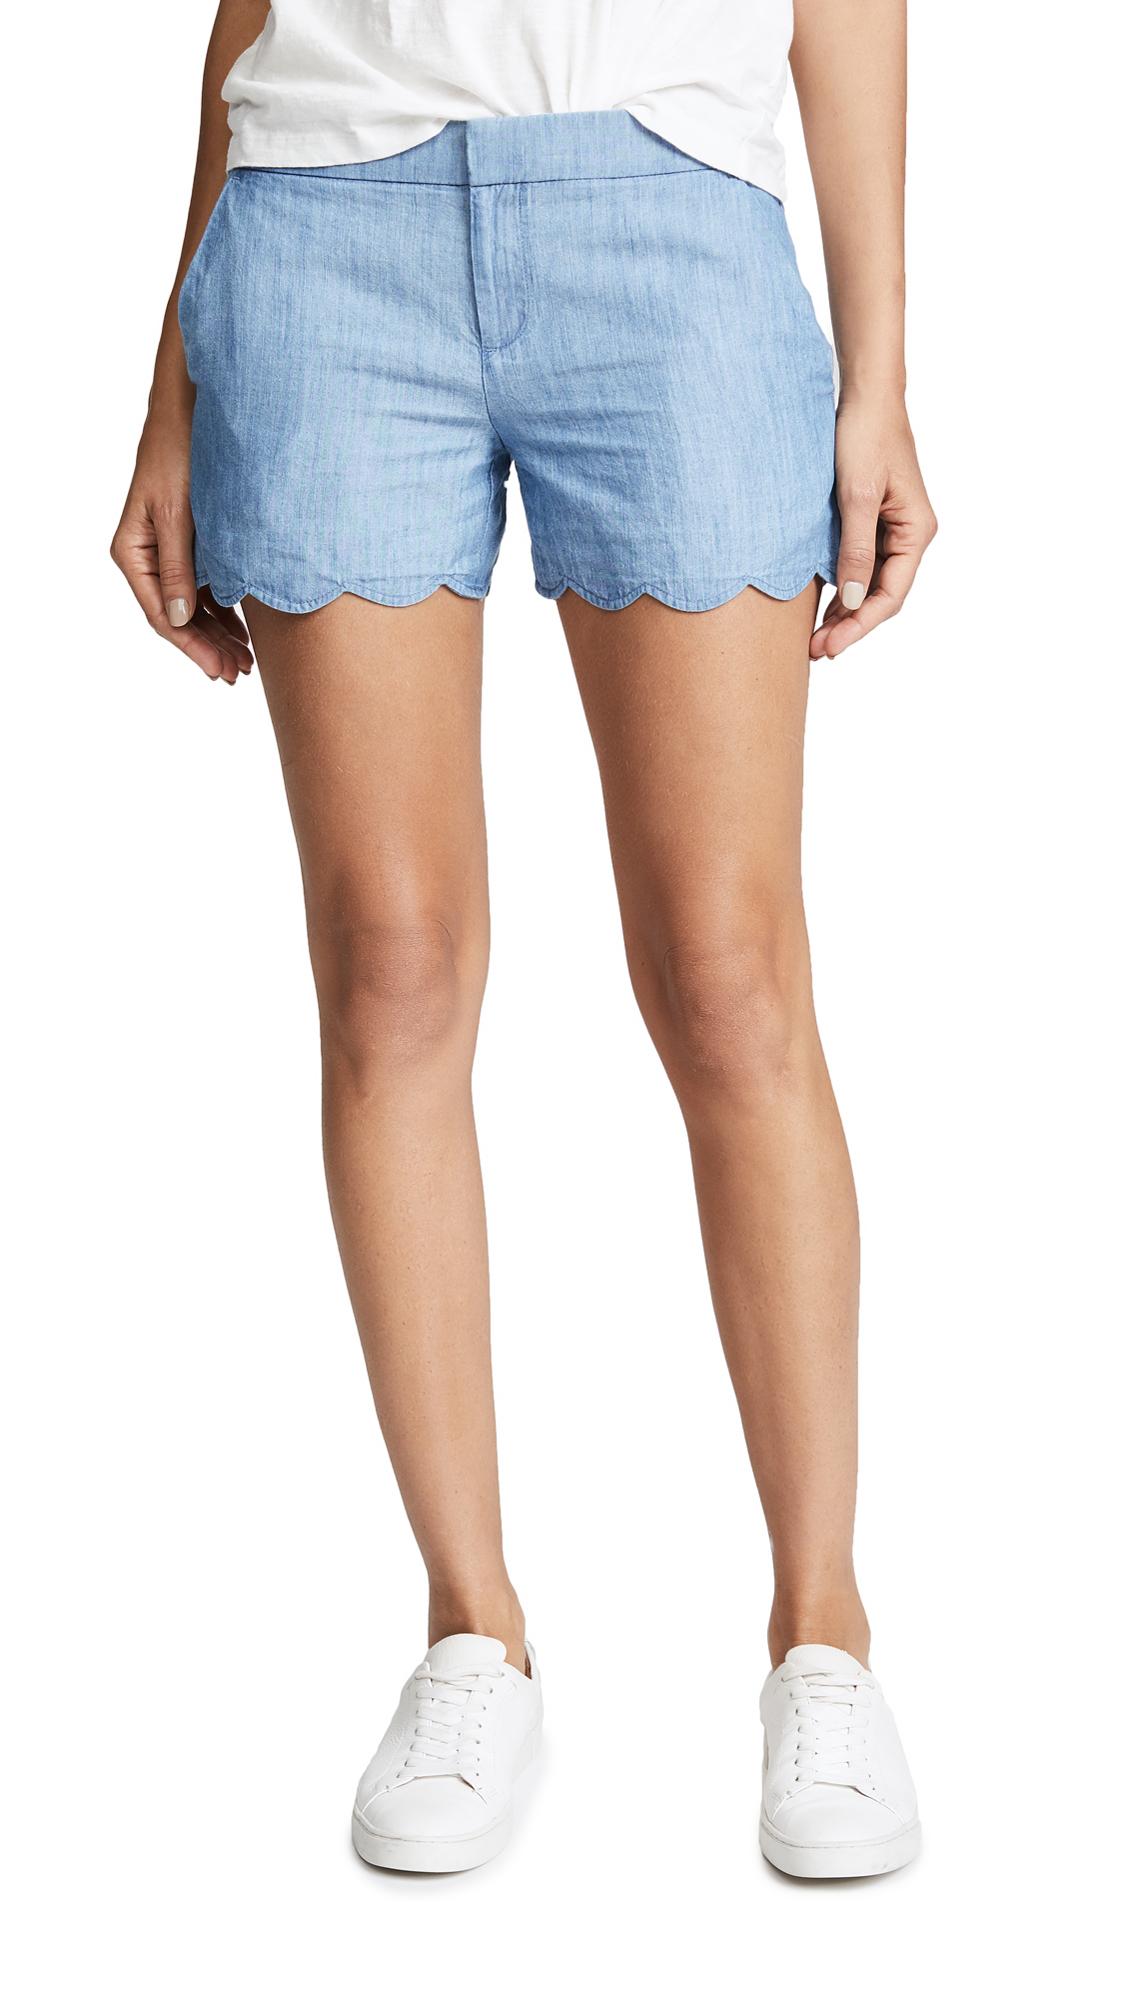 Club Monaco Amber Shorts - Indigo